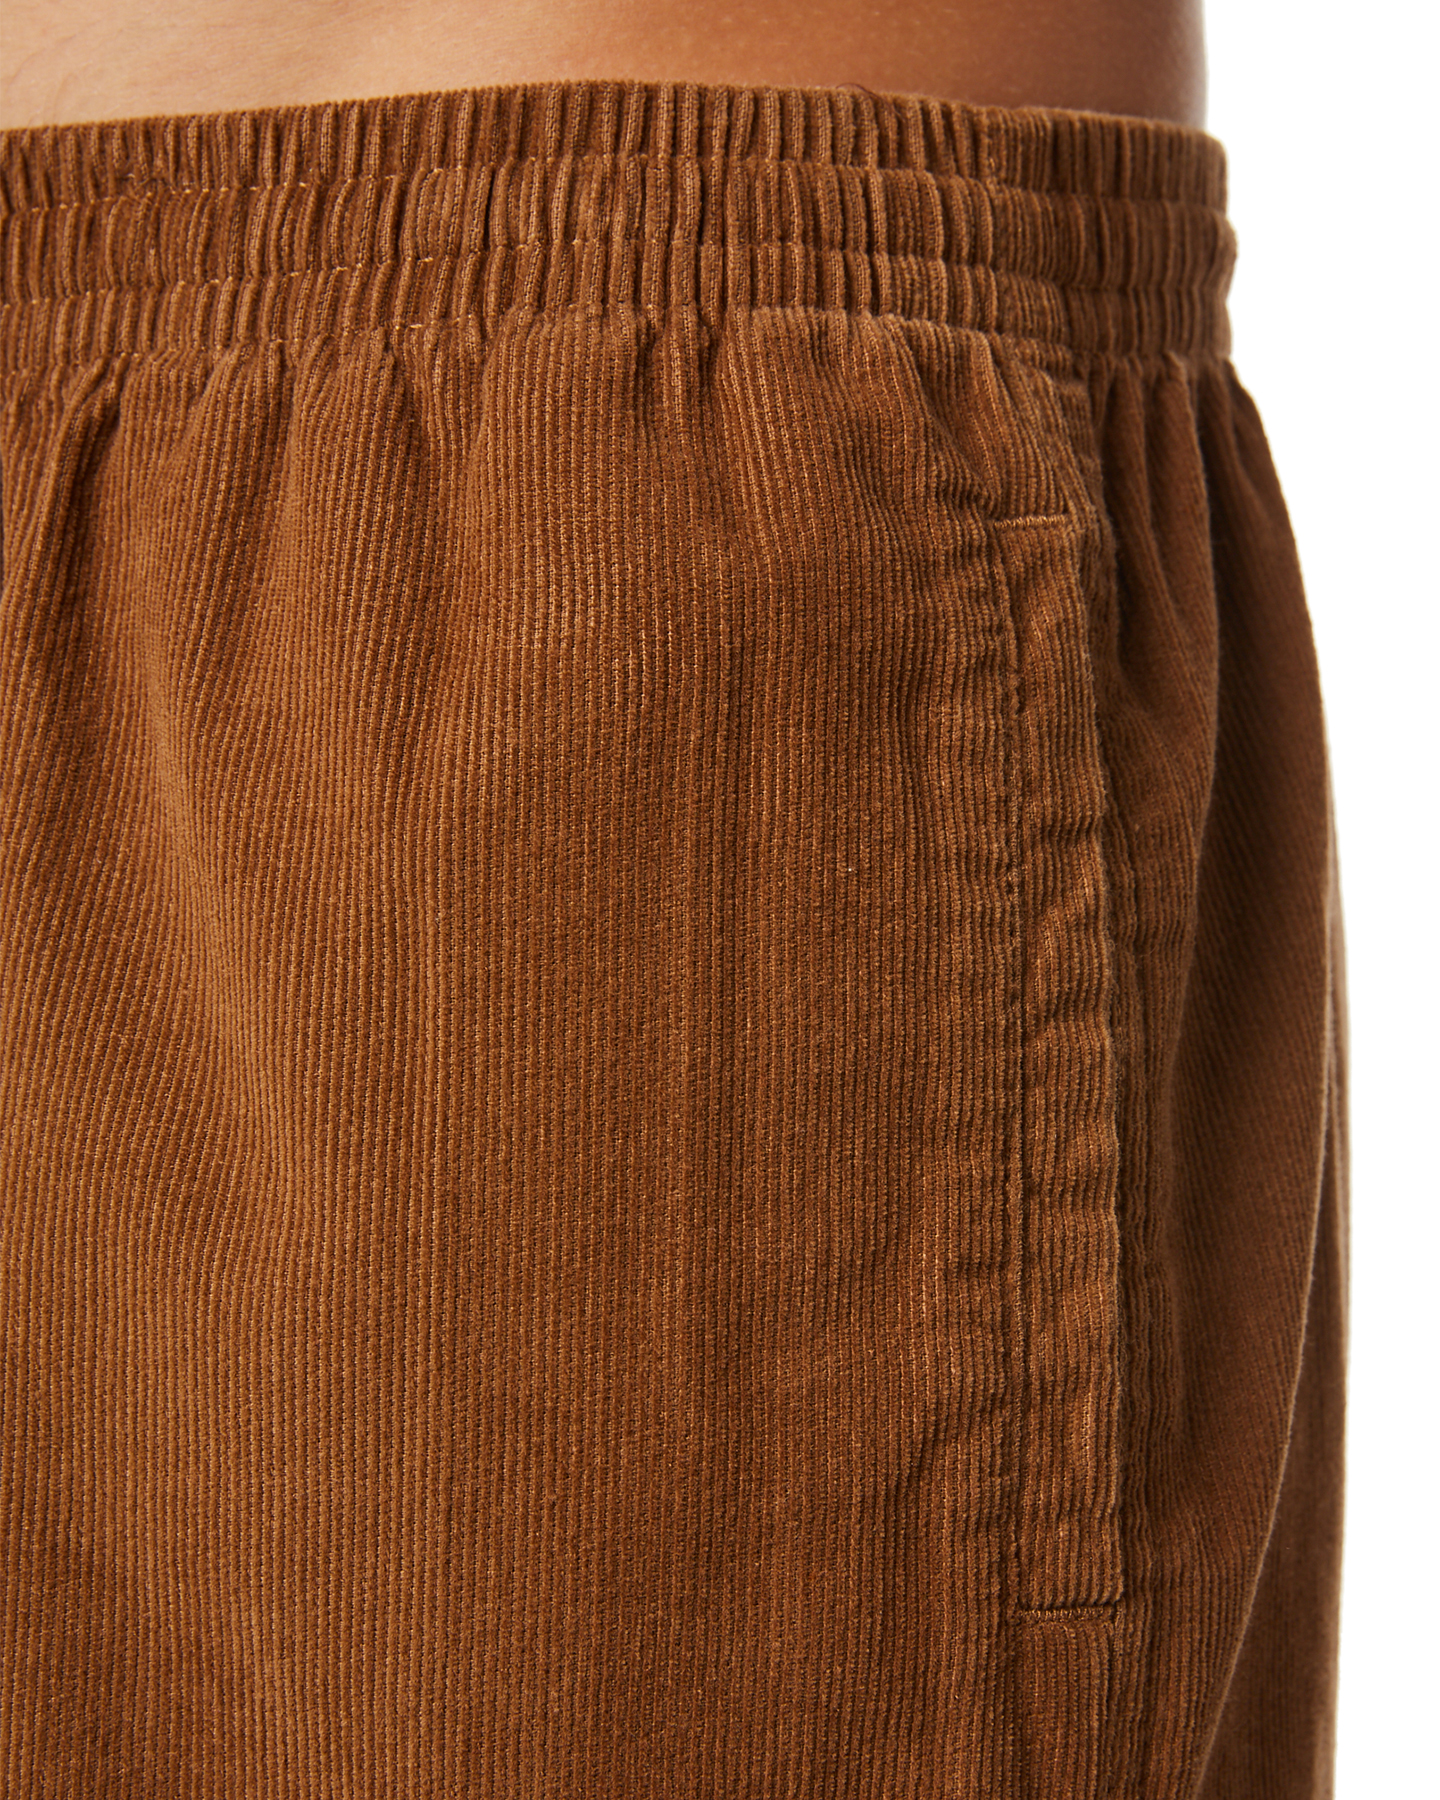 New-Rhythm-Men-039-s-Corduroy-Jam-Mens-Short-Cotton-Soft-Corduroy-Brown thumbnail 11